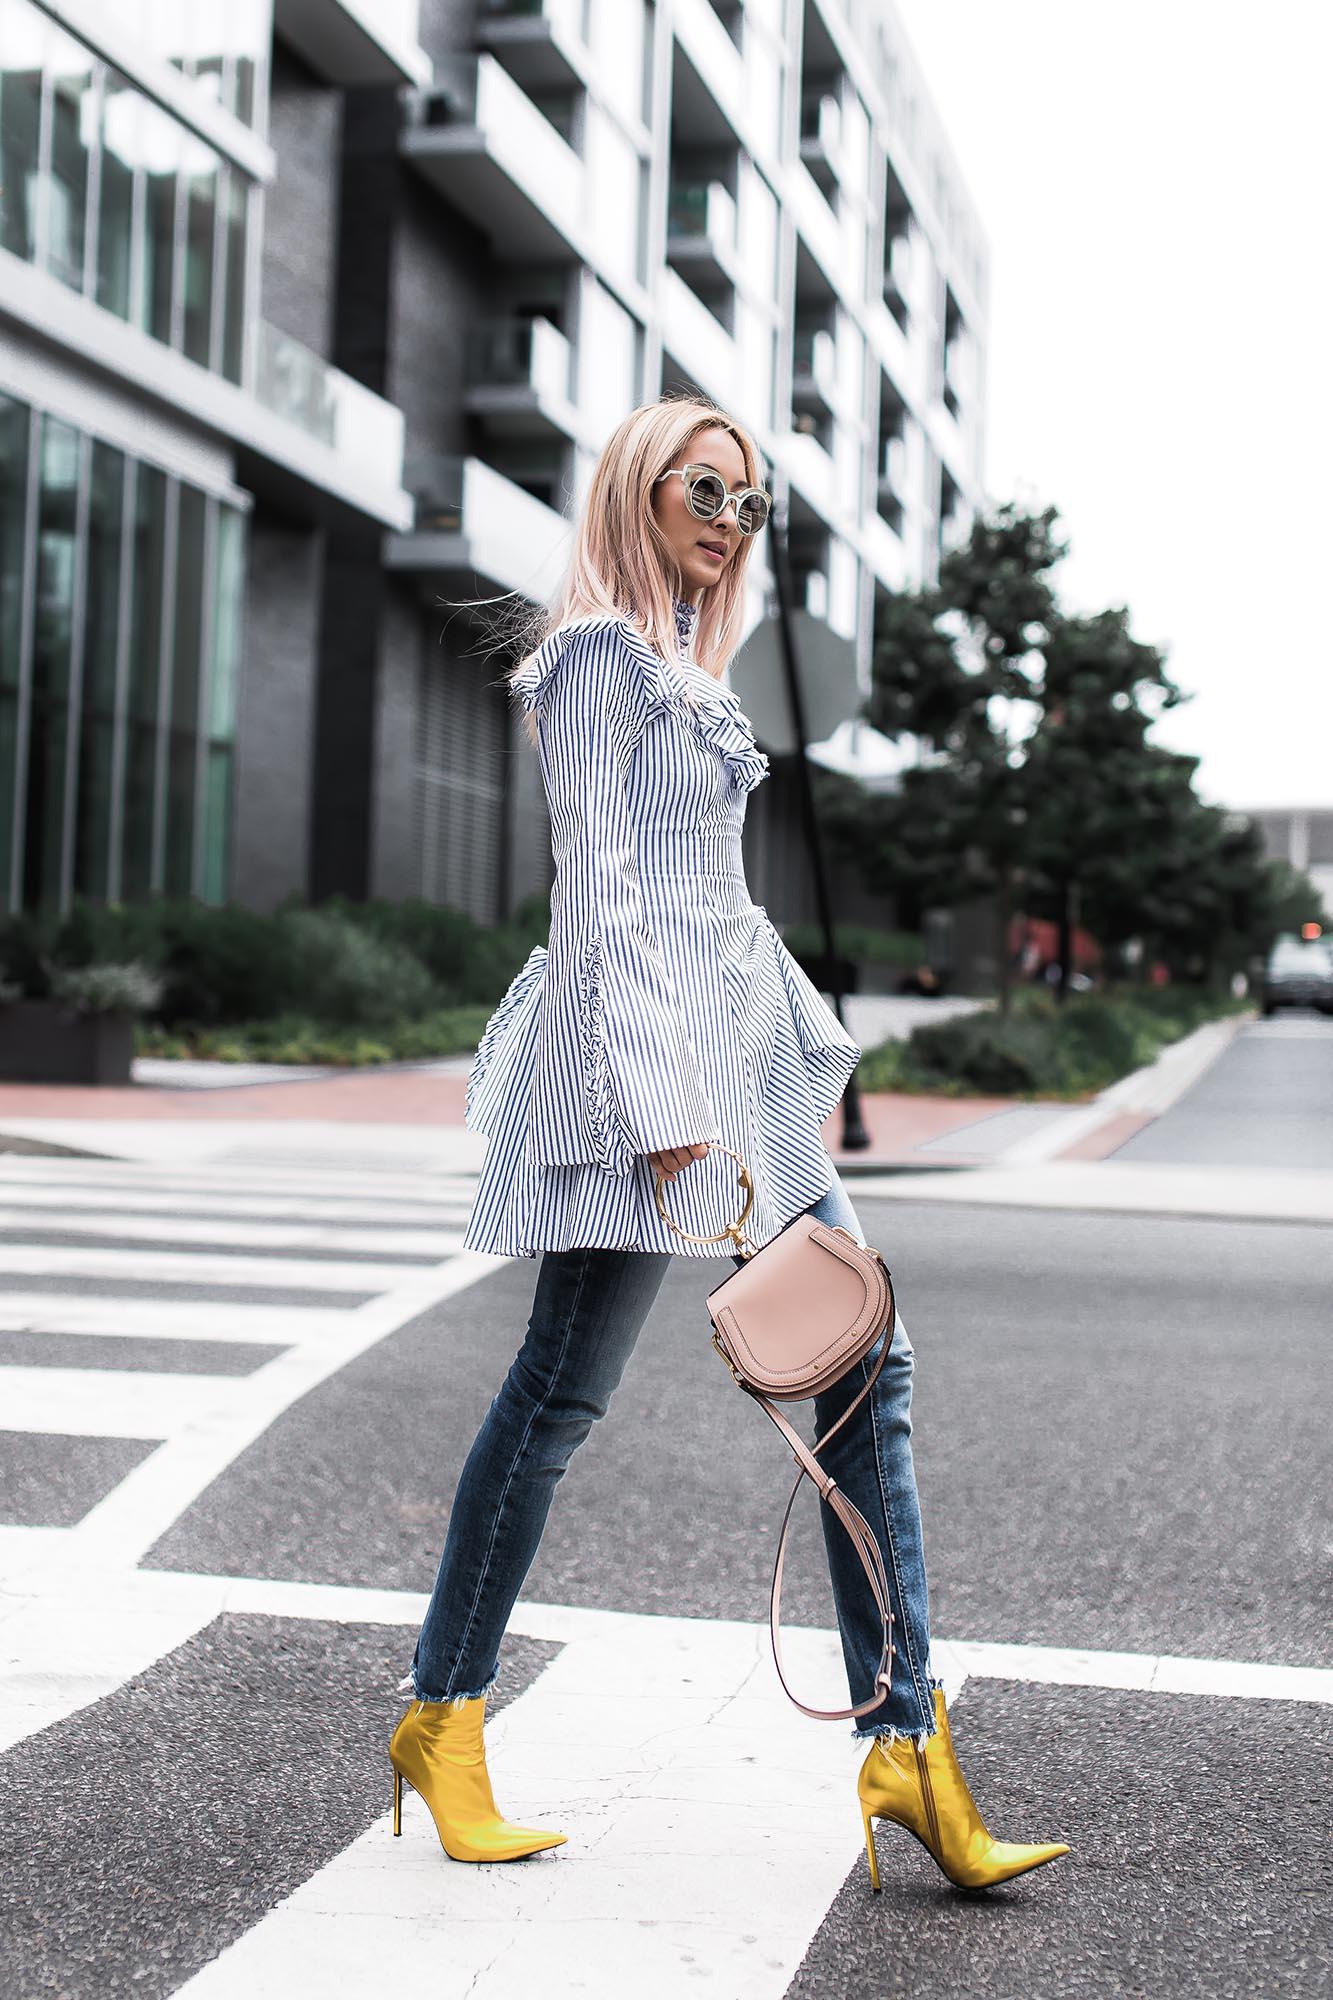 Anchyi Wei fashion blogger street style in Caroline Constas shirt dress, Chloe Nile bag and Haider Ackermann gold boots